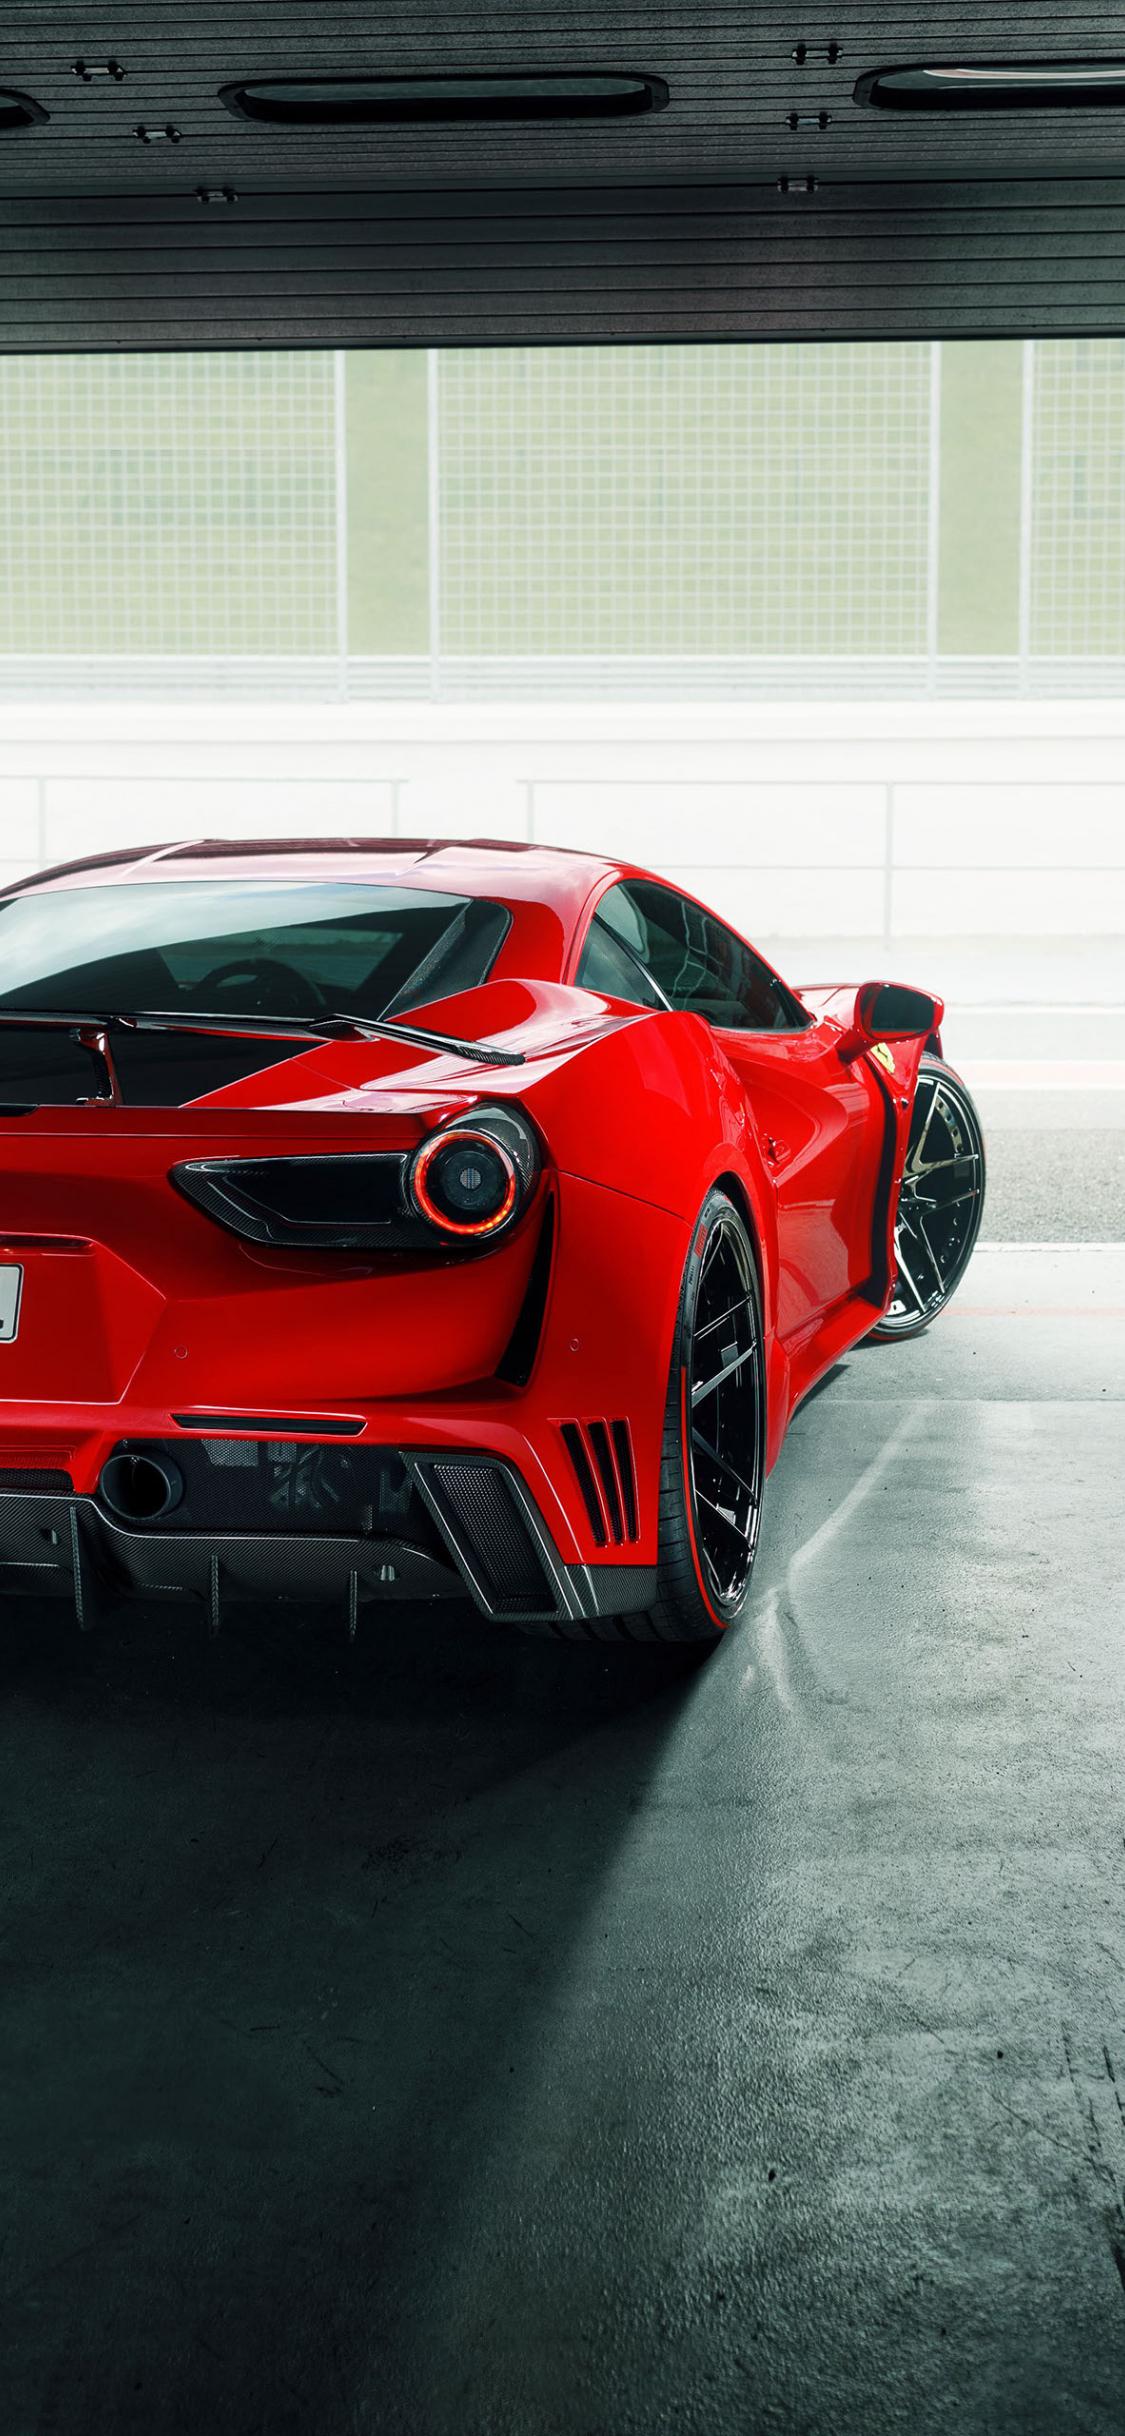 Download 1125x2436 Wallpaper Ferrari 488 Gtb Sports Car Rear